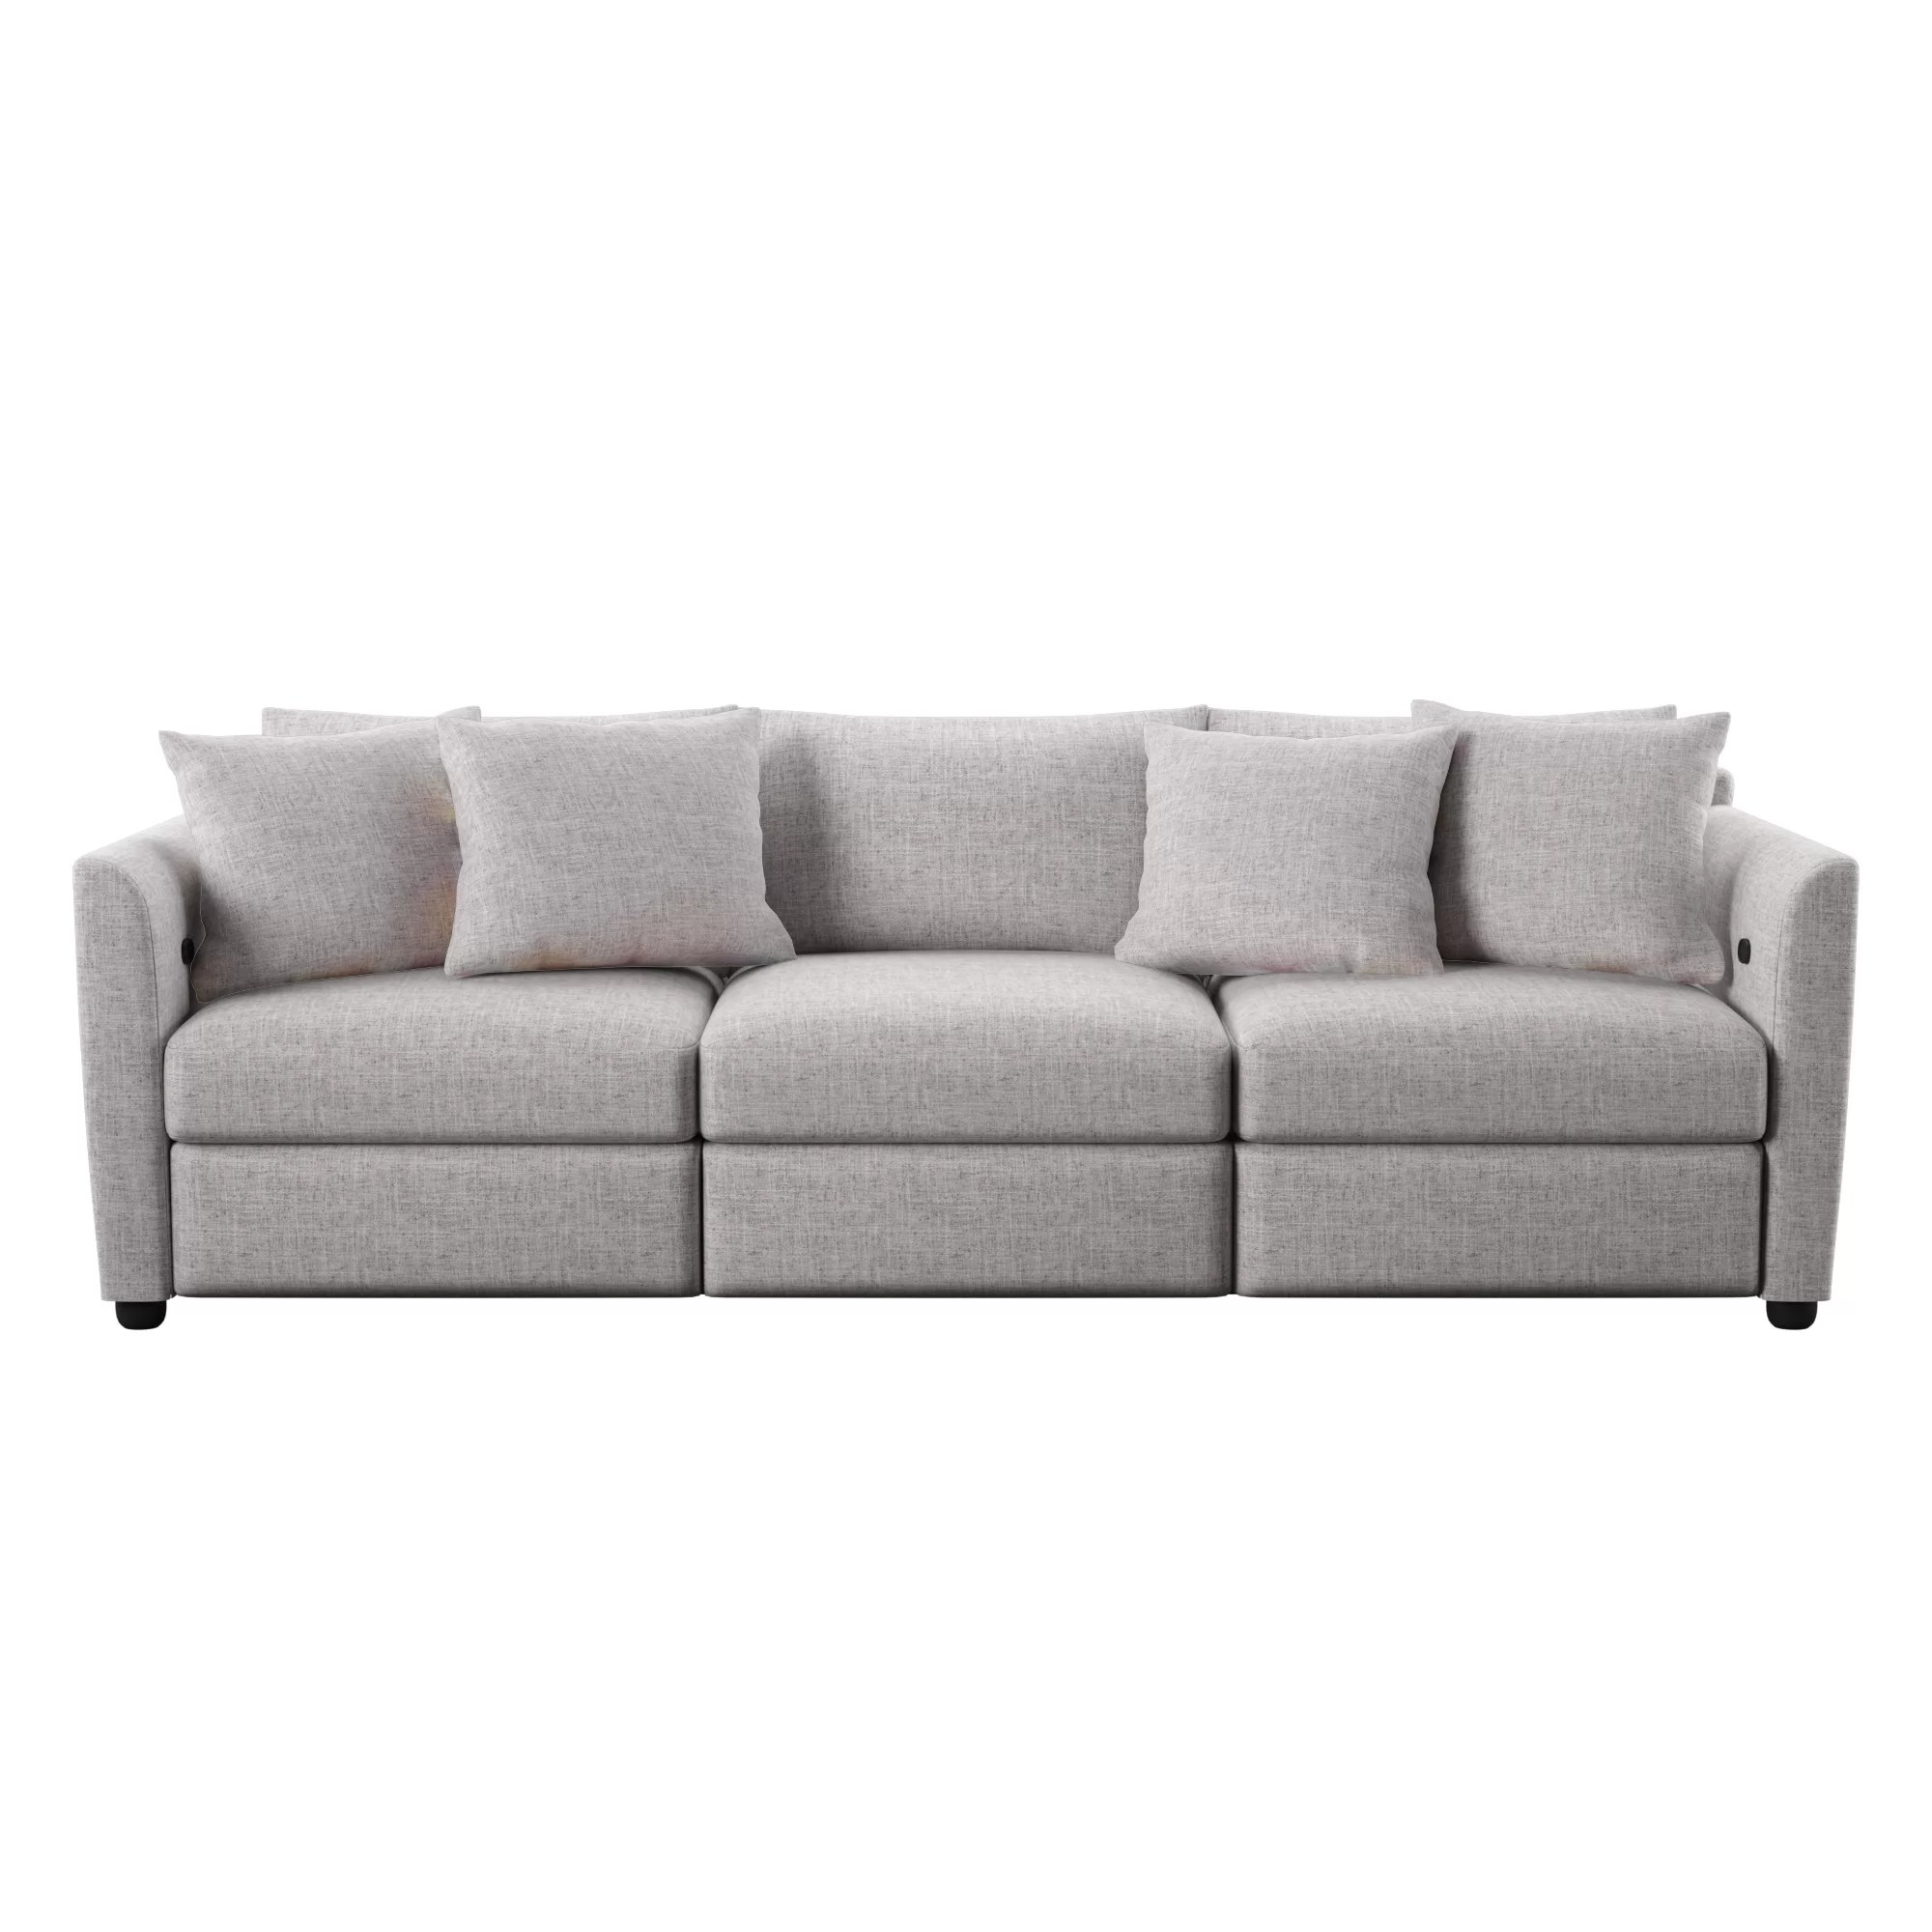 duo modern sofa bed sleeper beds dublin done deal allmodern custom upholstery